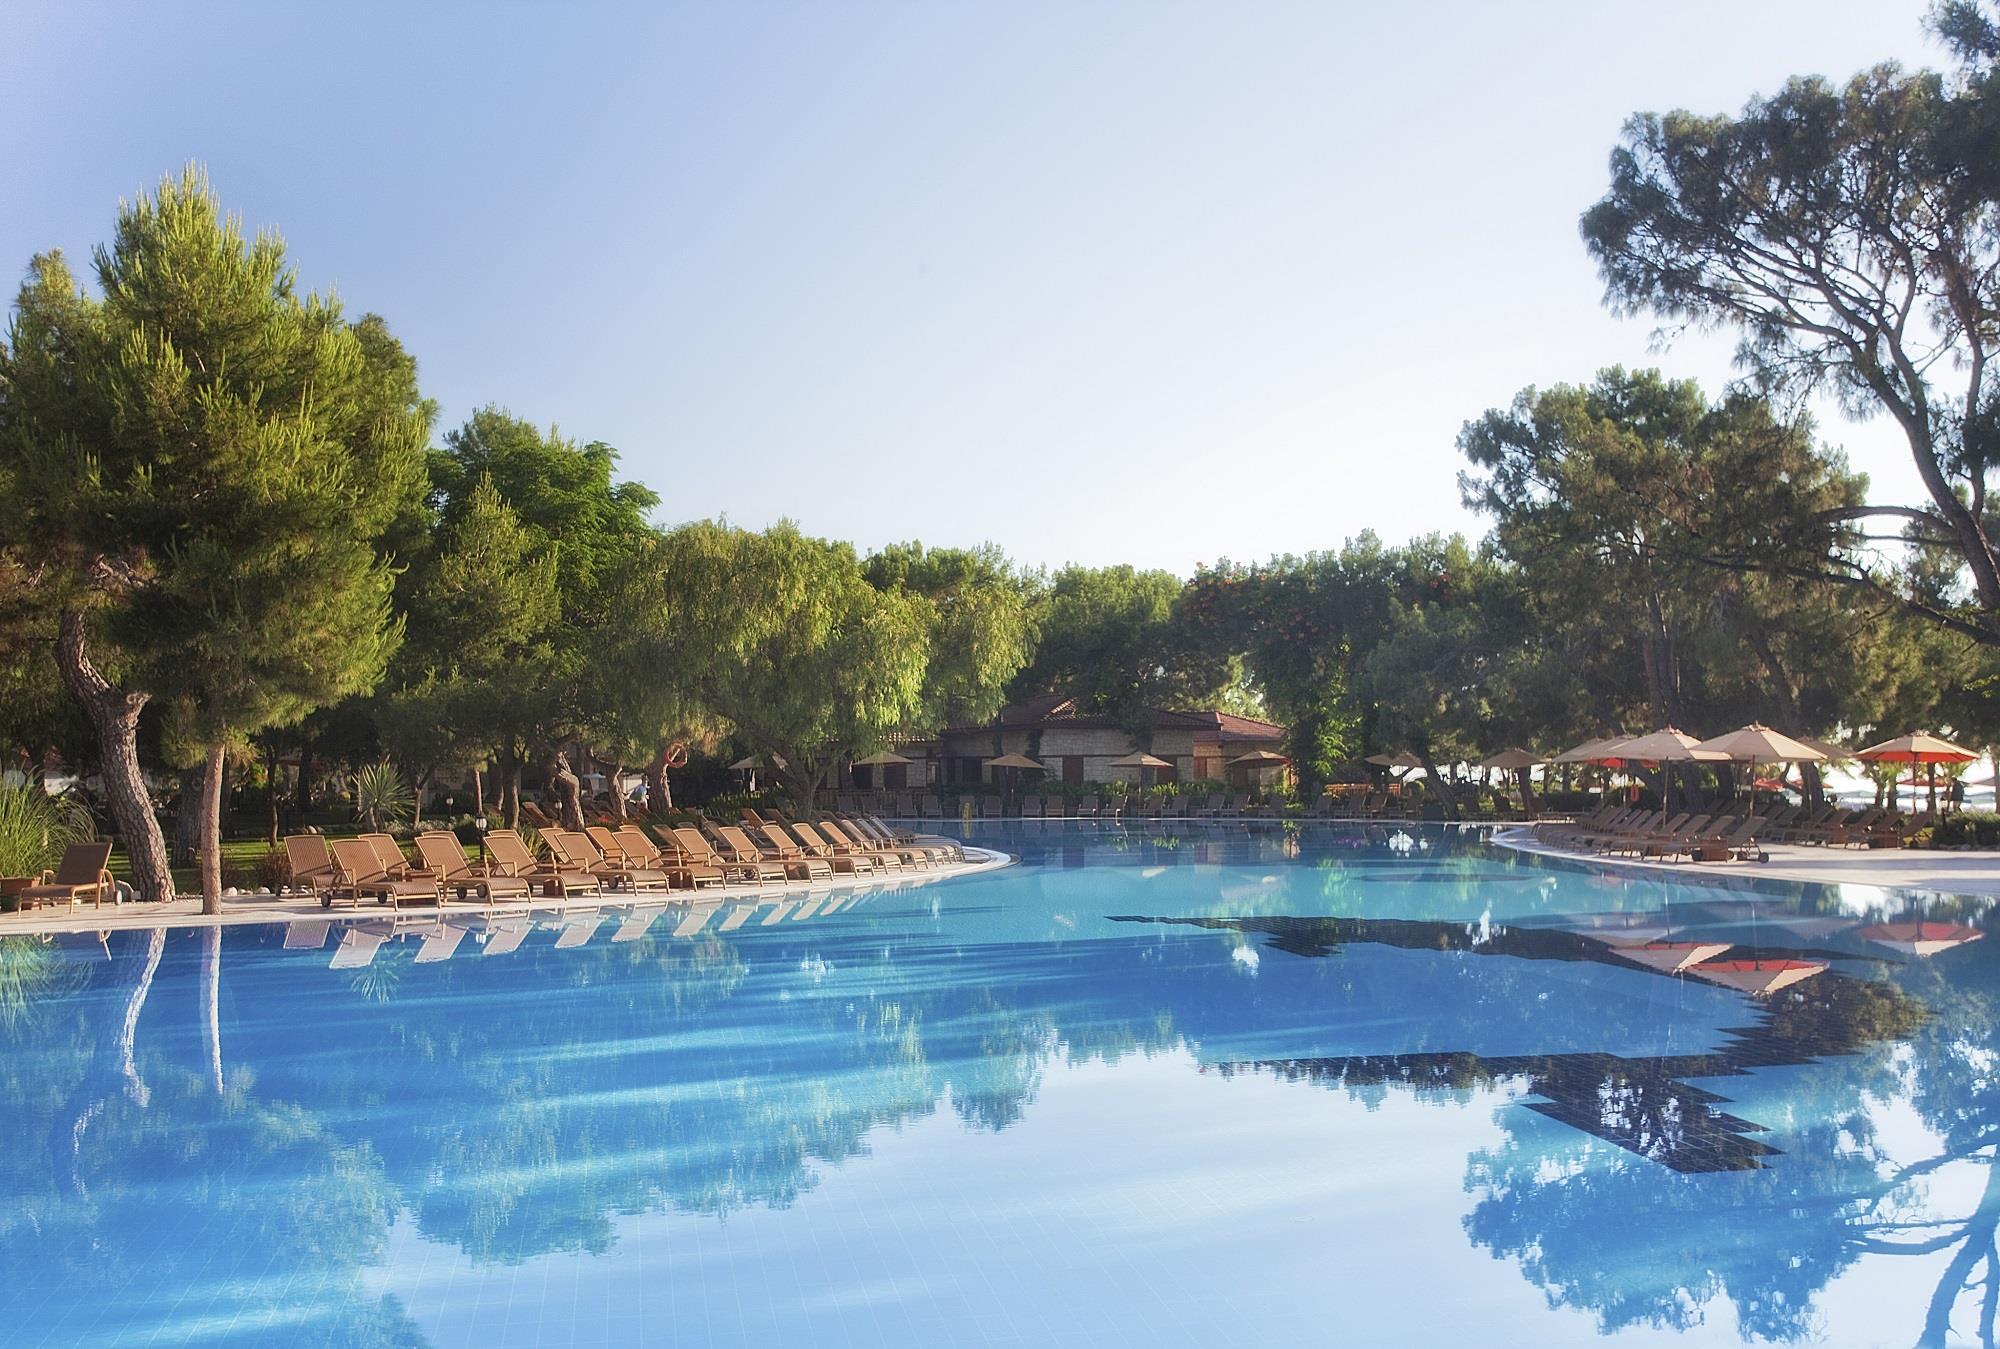 http://www.orextravel.sk/OREX/hotelphotos/akka-hotels-antedon-general-0039.jpg